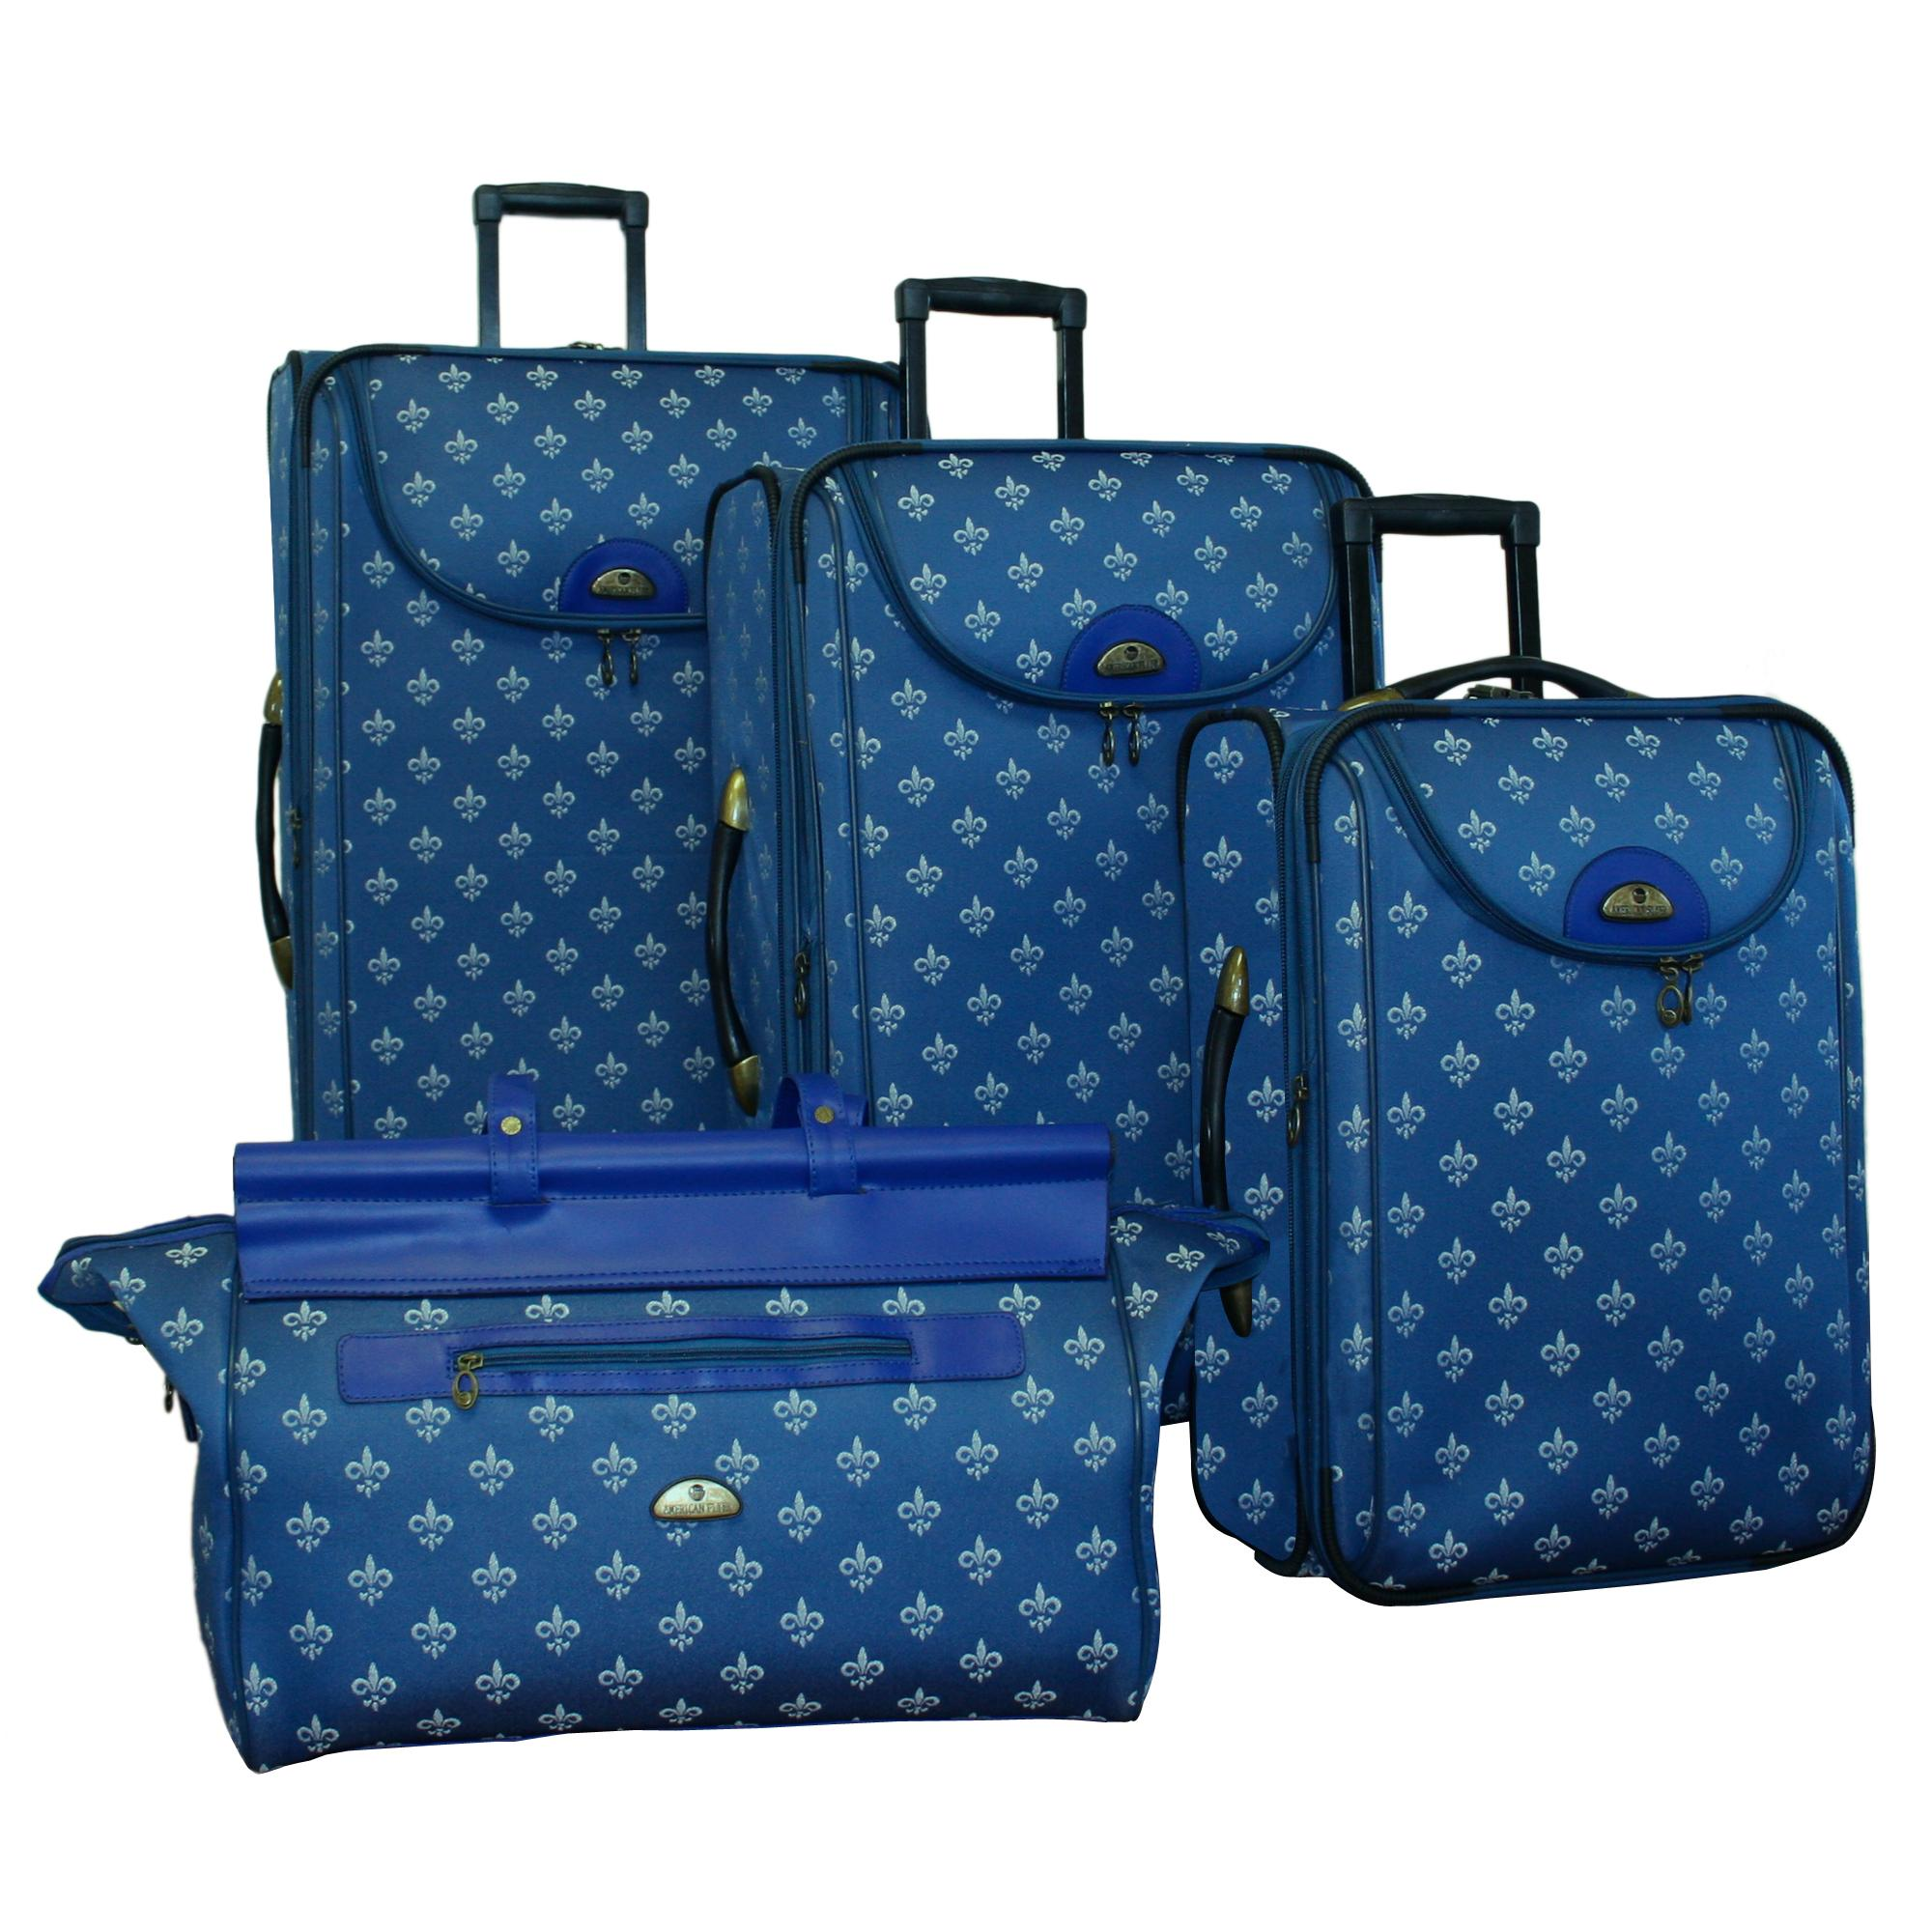 American Flyer Lyon Blue 4-piece Luggage Set